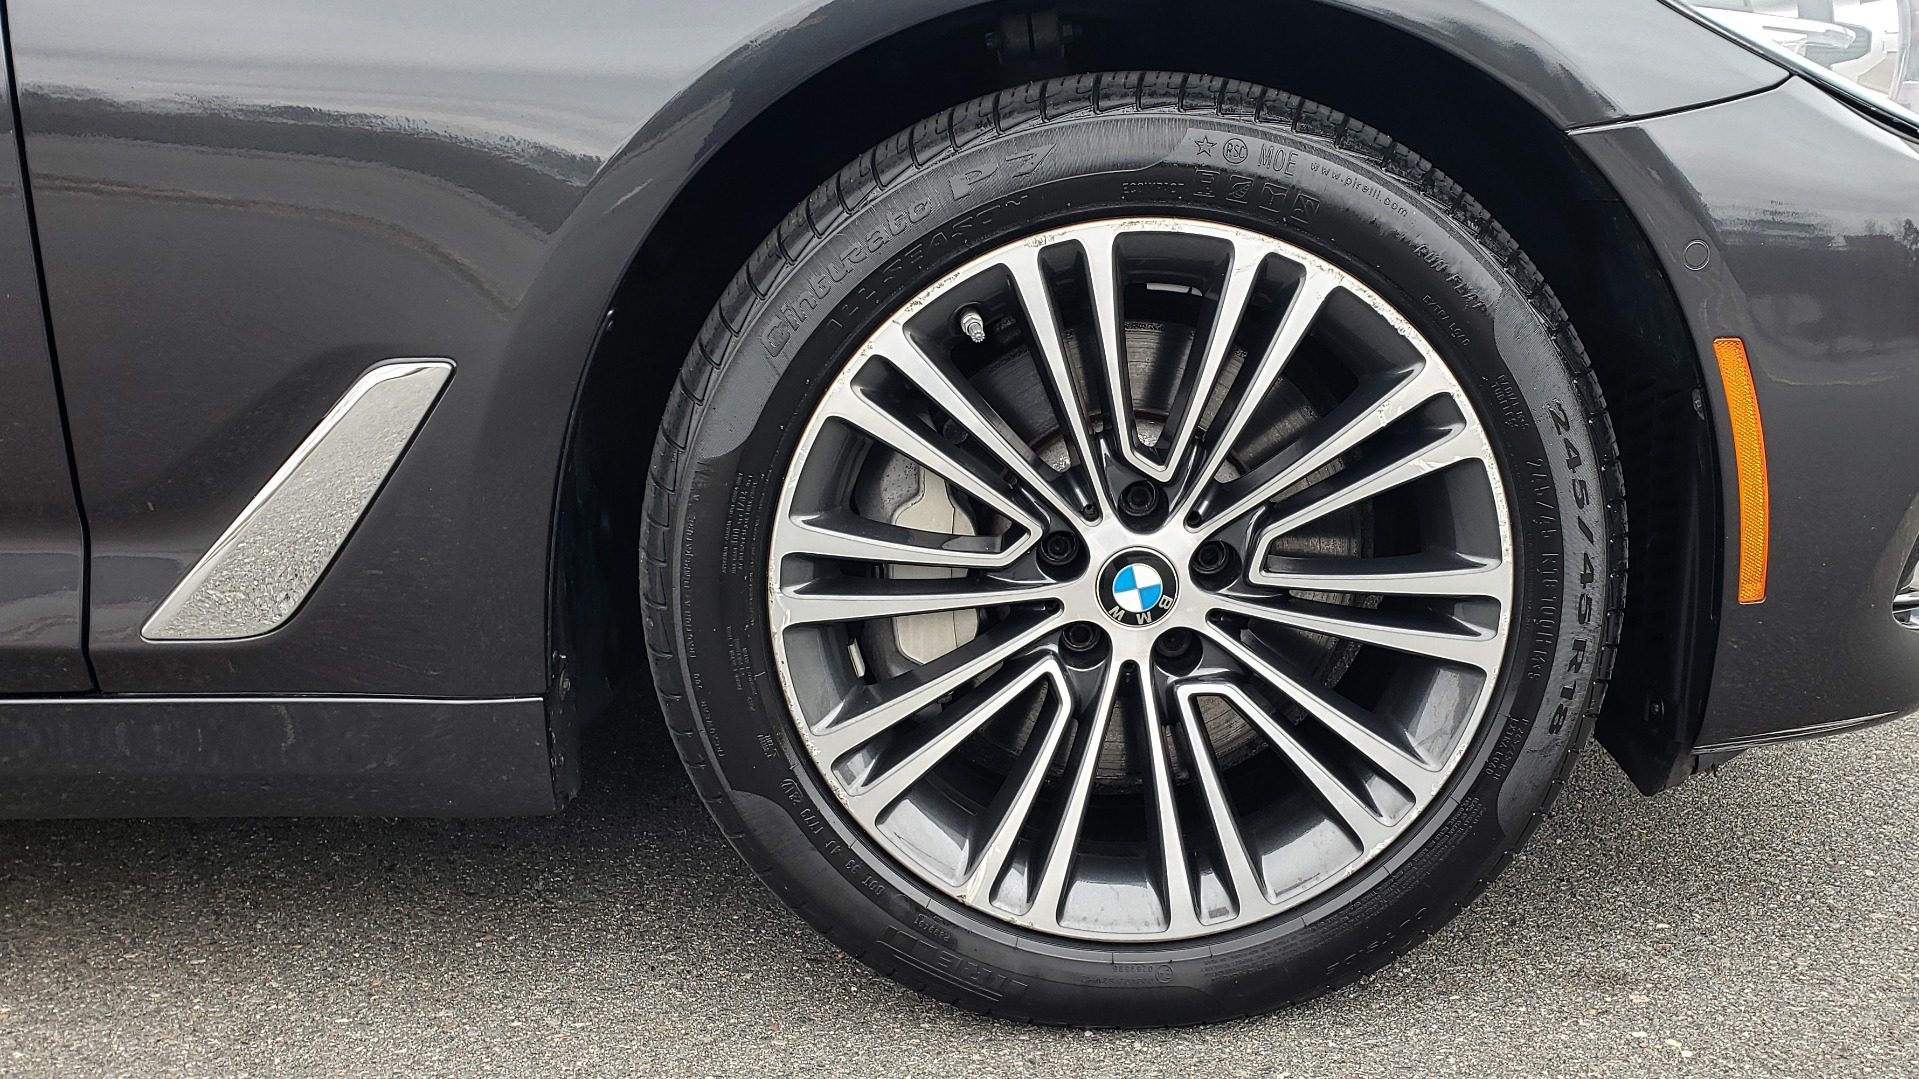 Used 2017 BMW 5 SERIES 530IXDRIVE / PREM PKG / DRVR ASST PLUS / CLD WTHR / APPLE CARPLAY for sale Sold at Formula Imports in Charlotte NC 28227 82